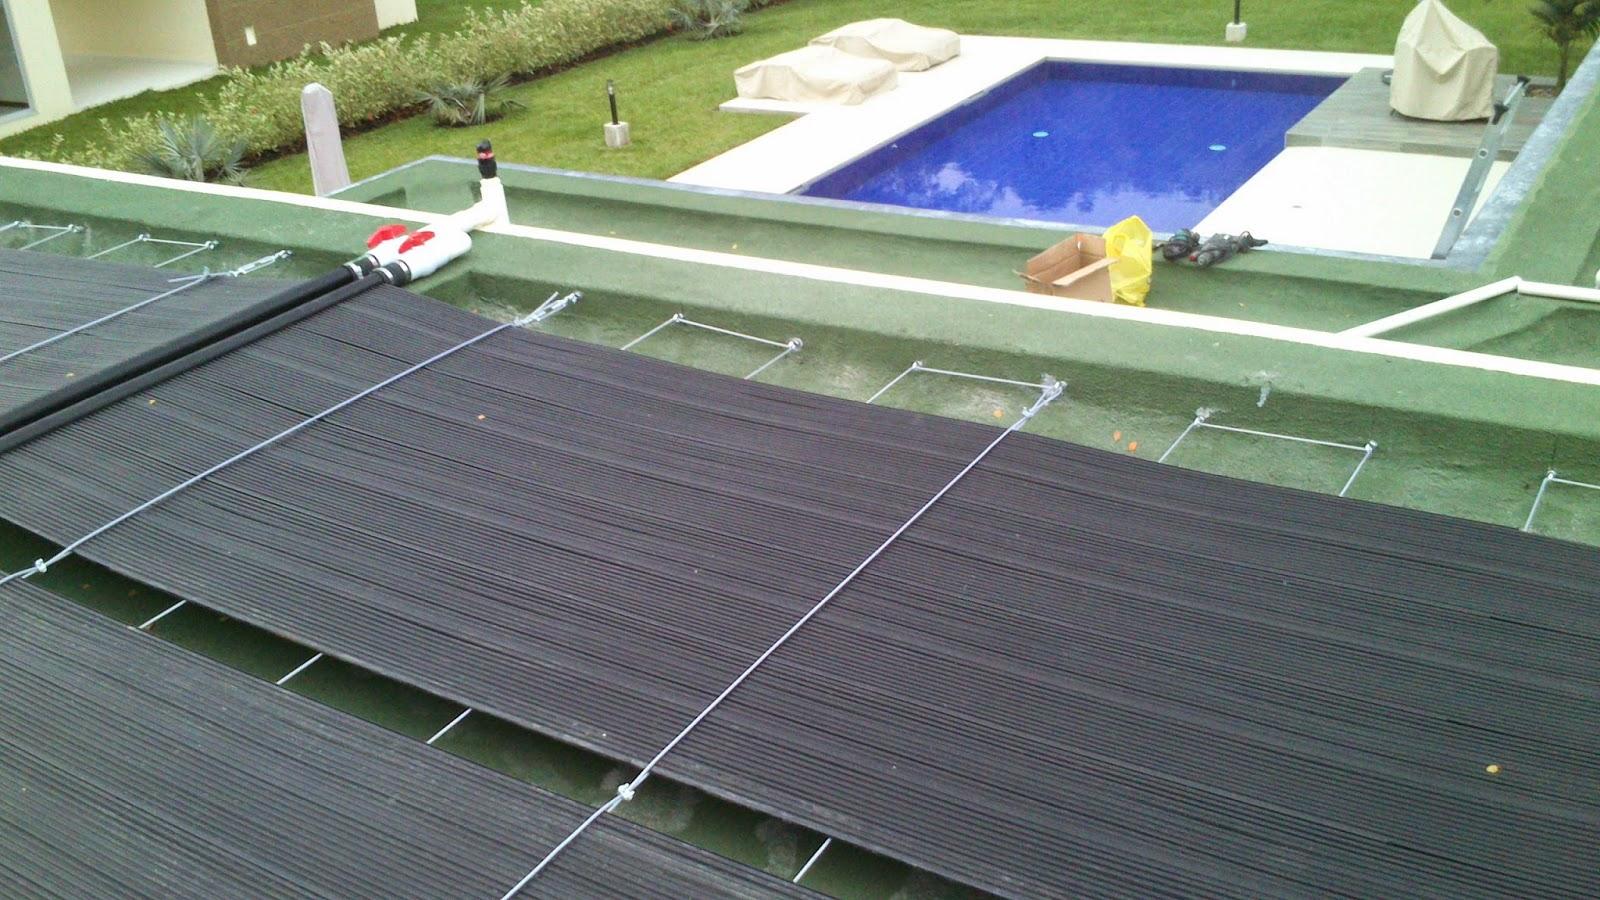 Calentadores de piscinas solares